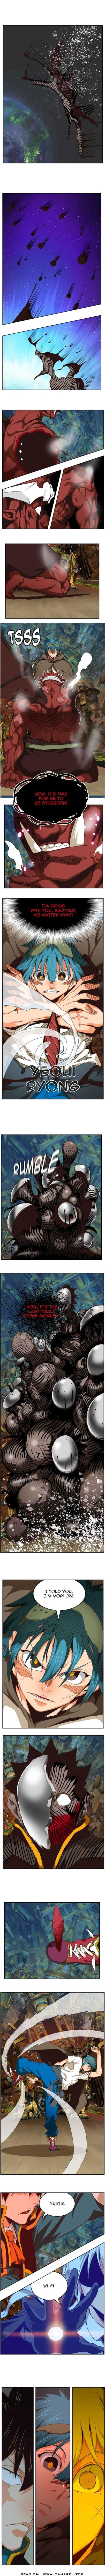 The God Of High School Chapter 525 page 6 - Mangakakalot